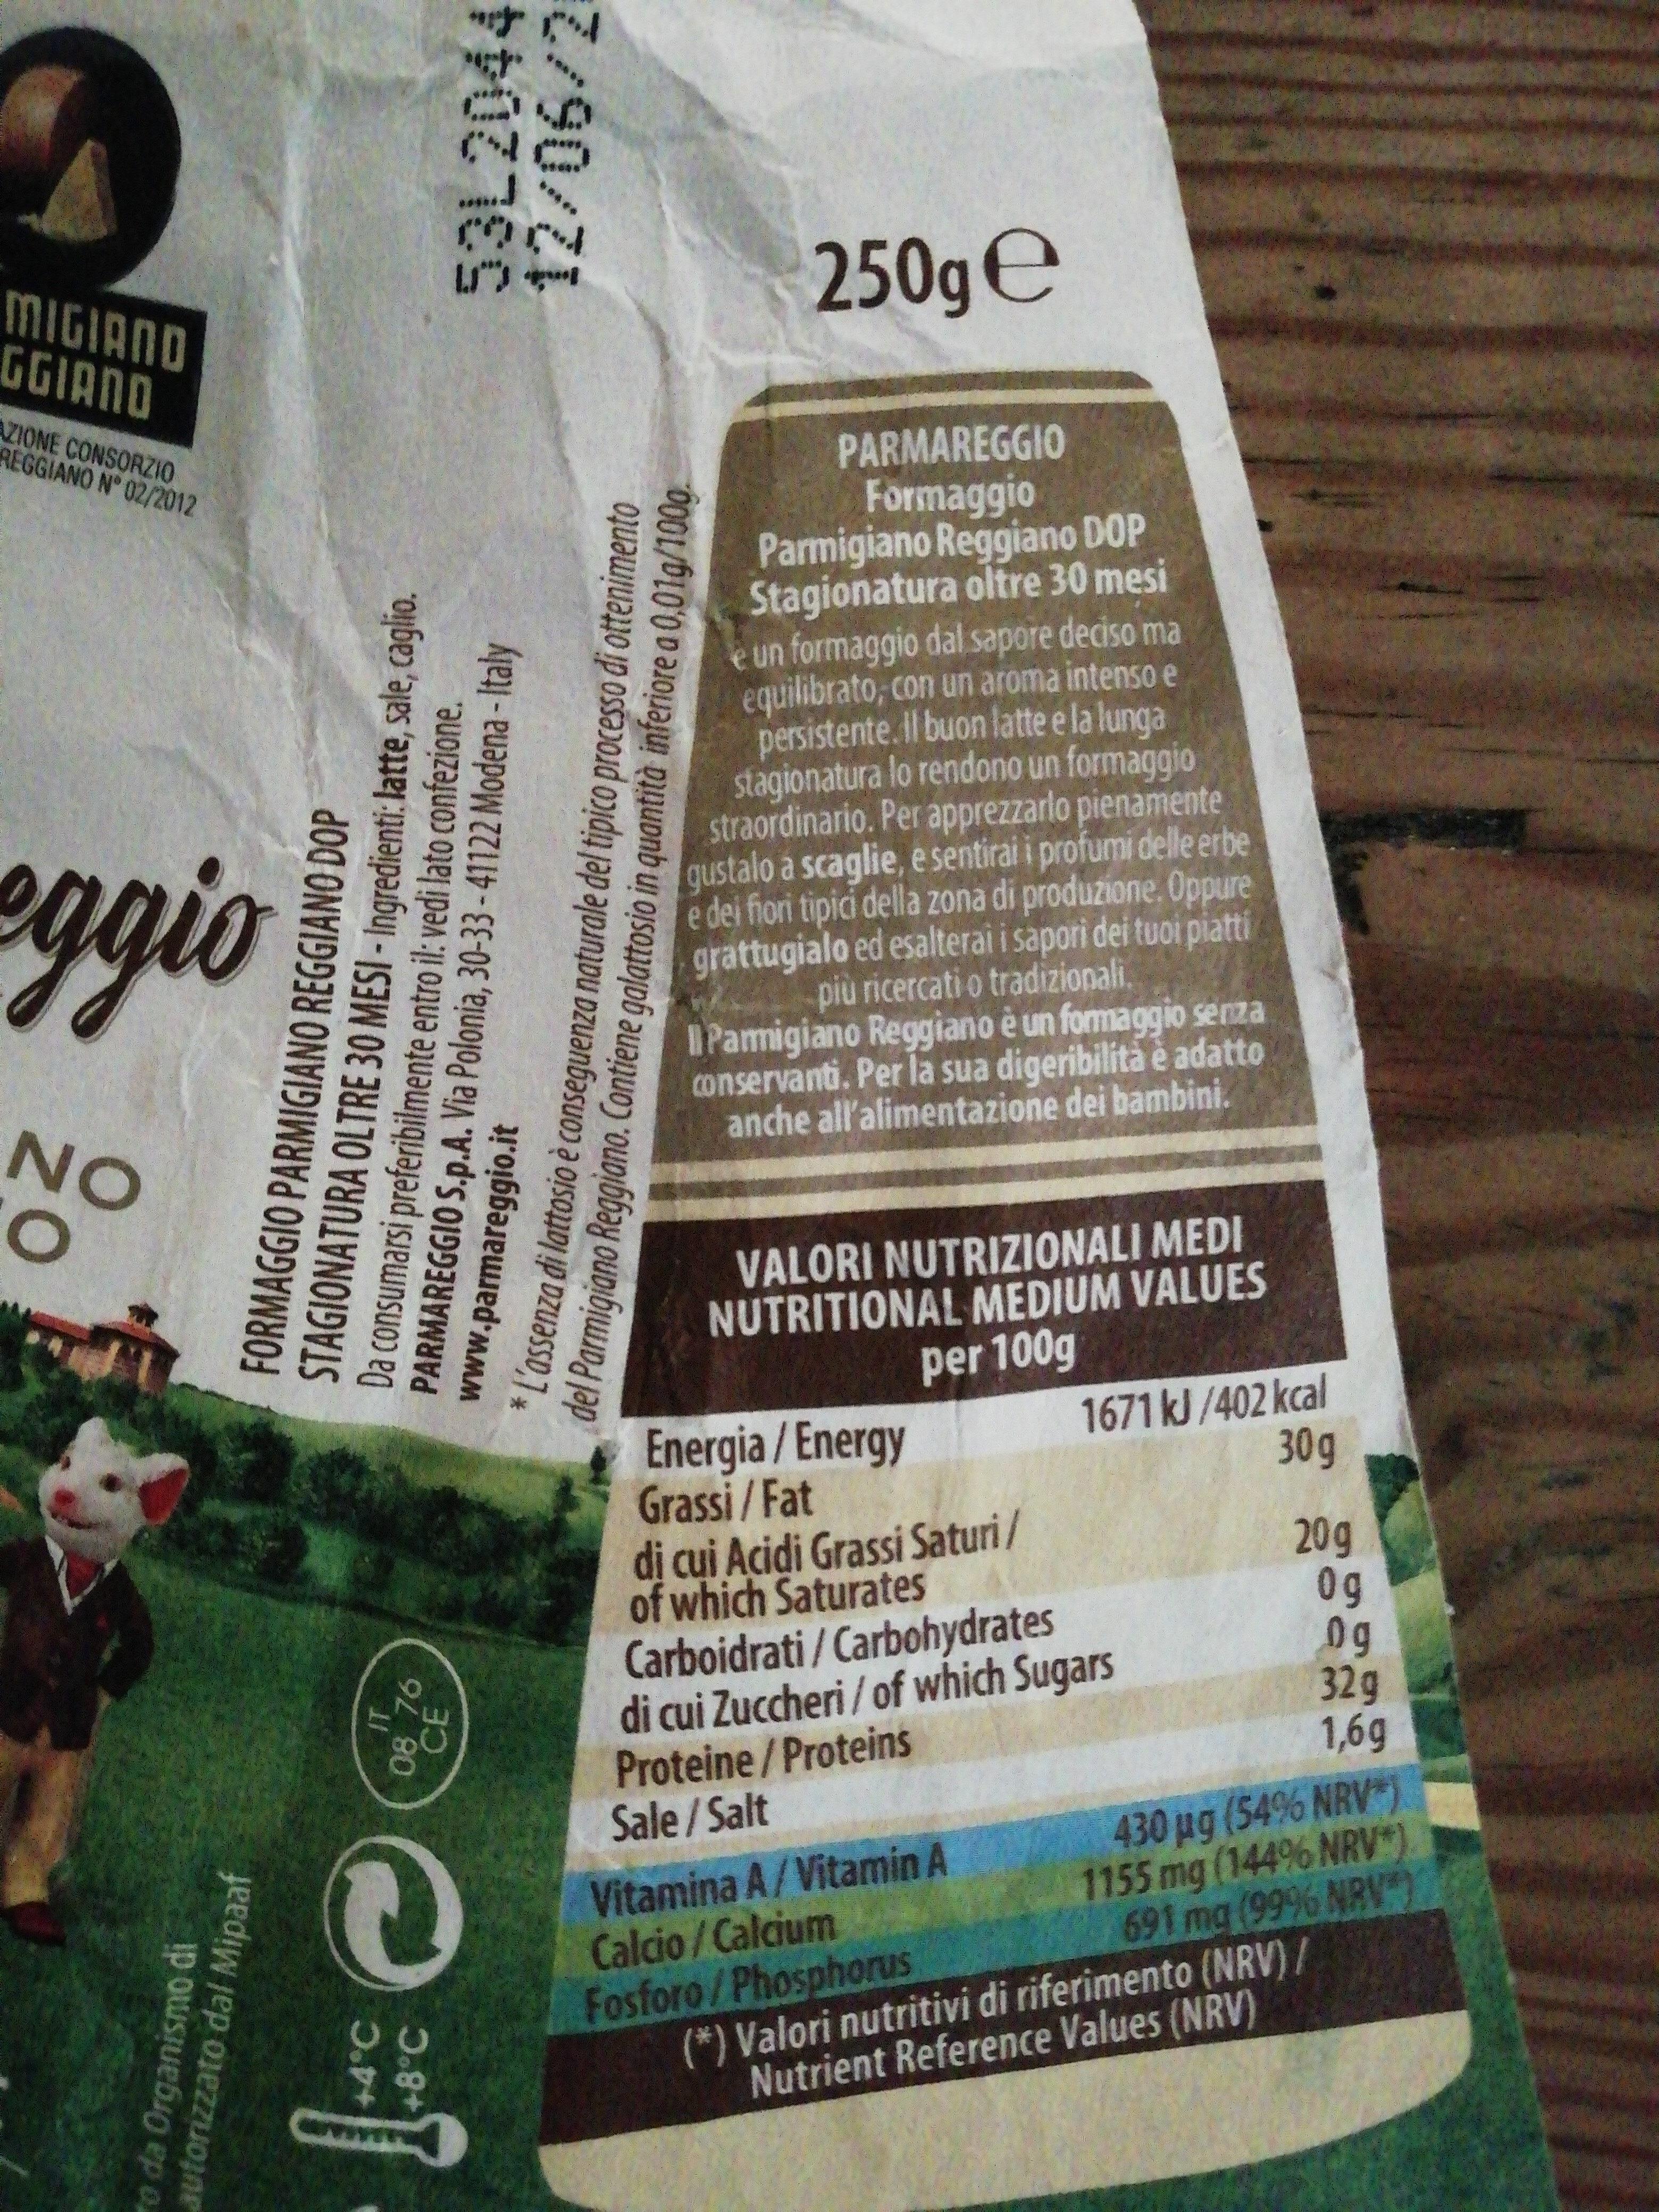 Parmigiano Reggiano 30 Mois D. o. p - Ingrediënten - fr